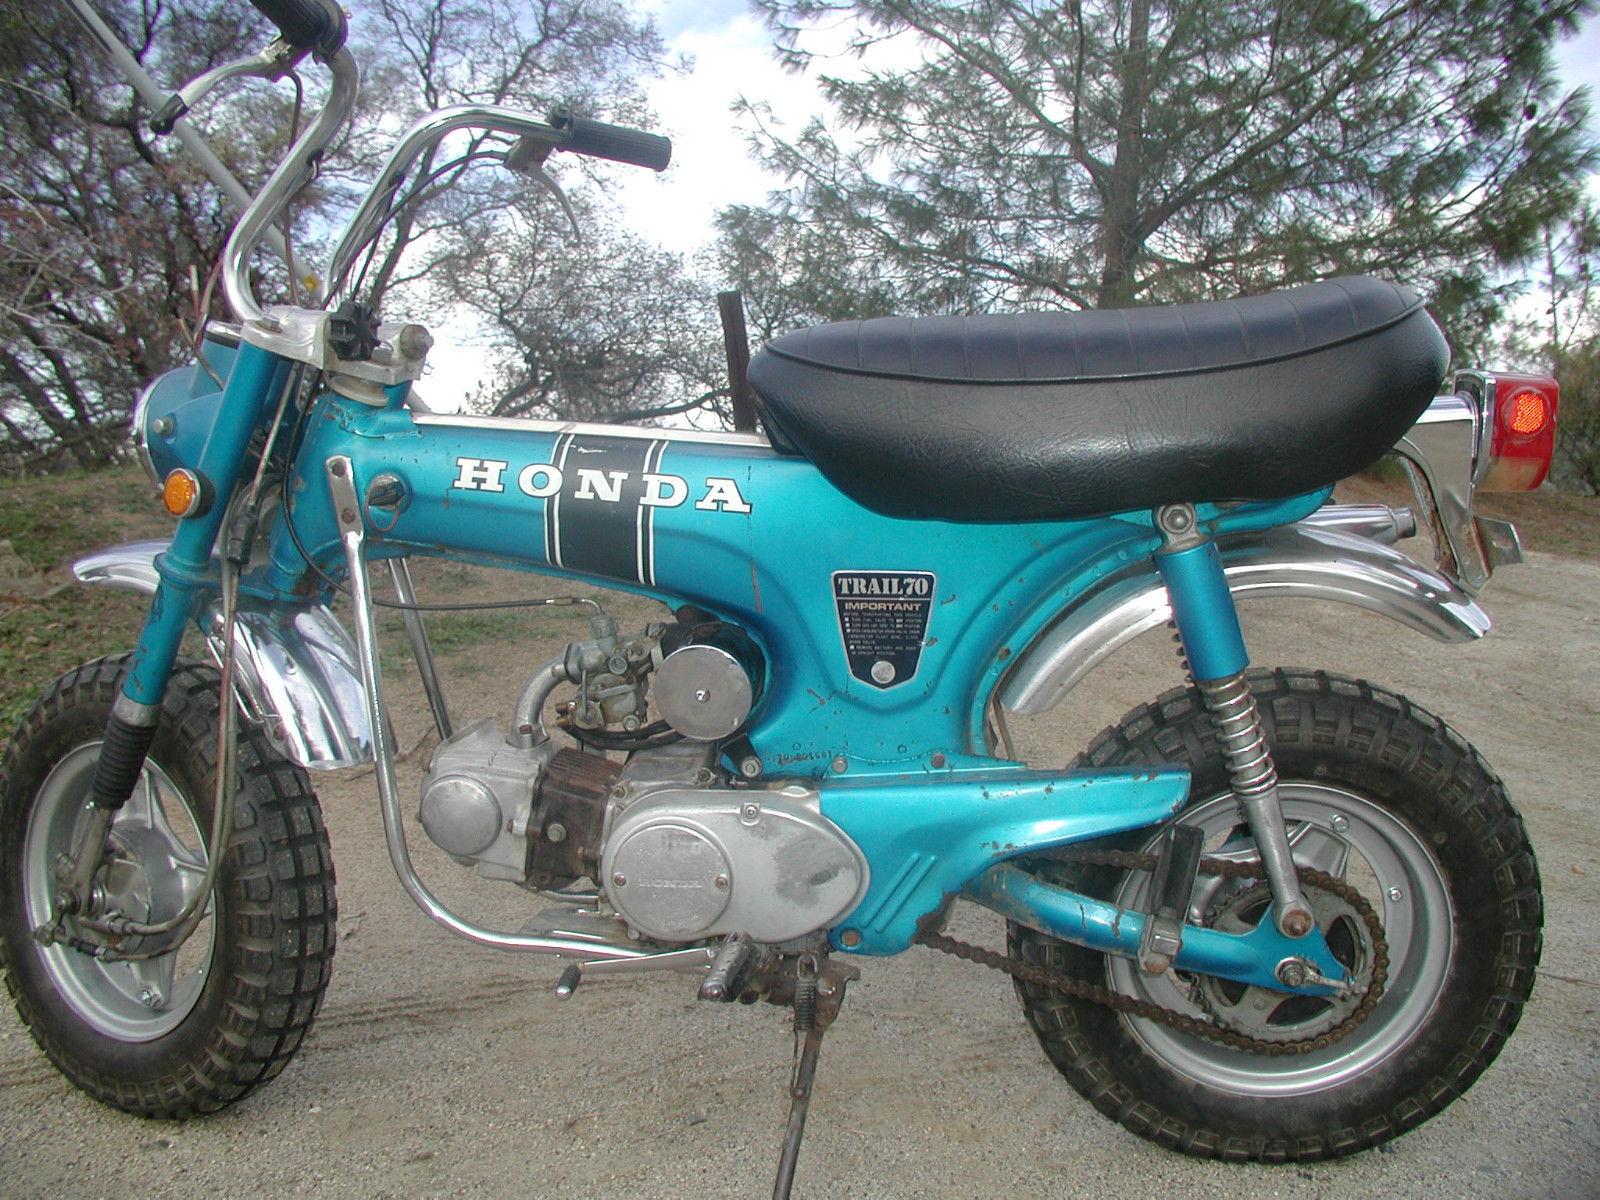 Honda Trail Ct Ct Think Christmas Great Mid Life Crisis Gift For Someone on Honda Trail 70 Ebay